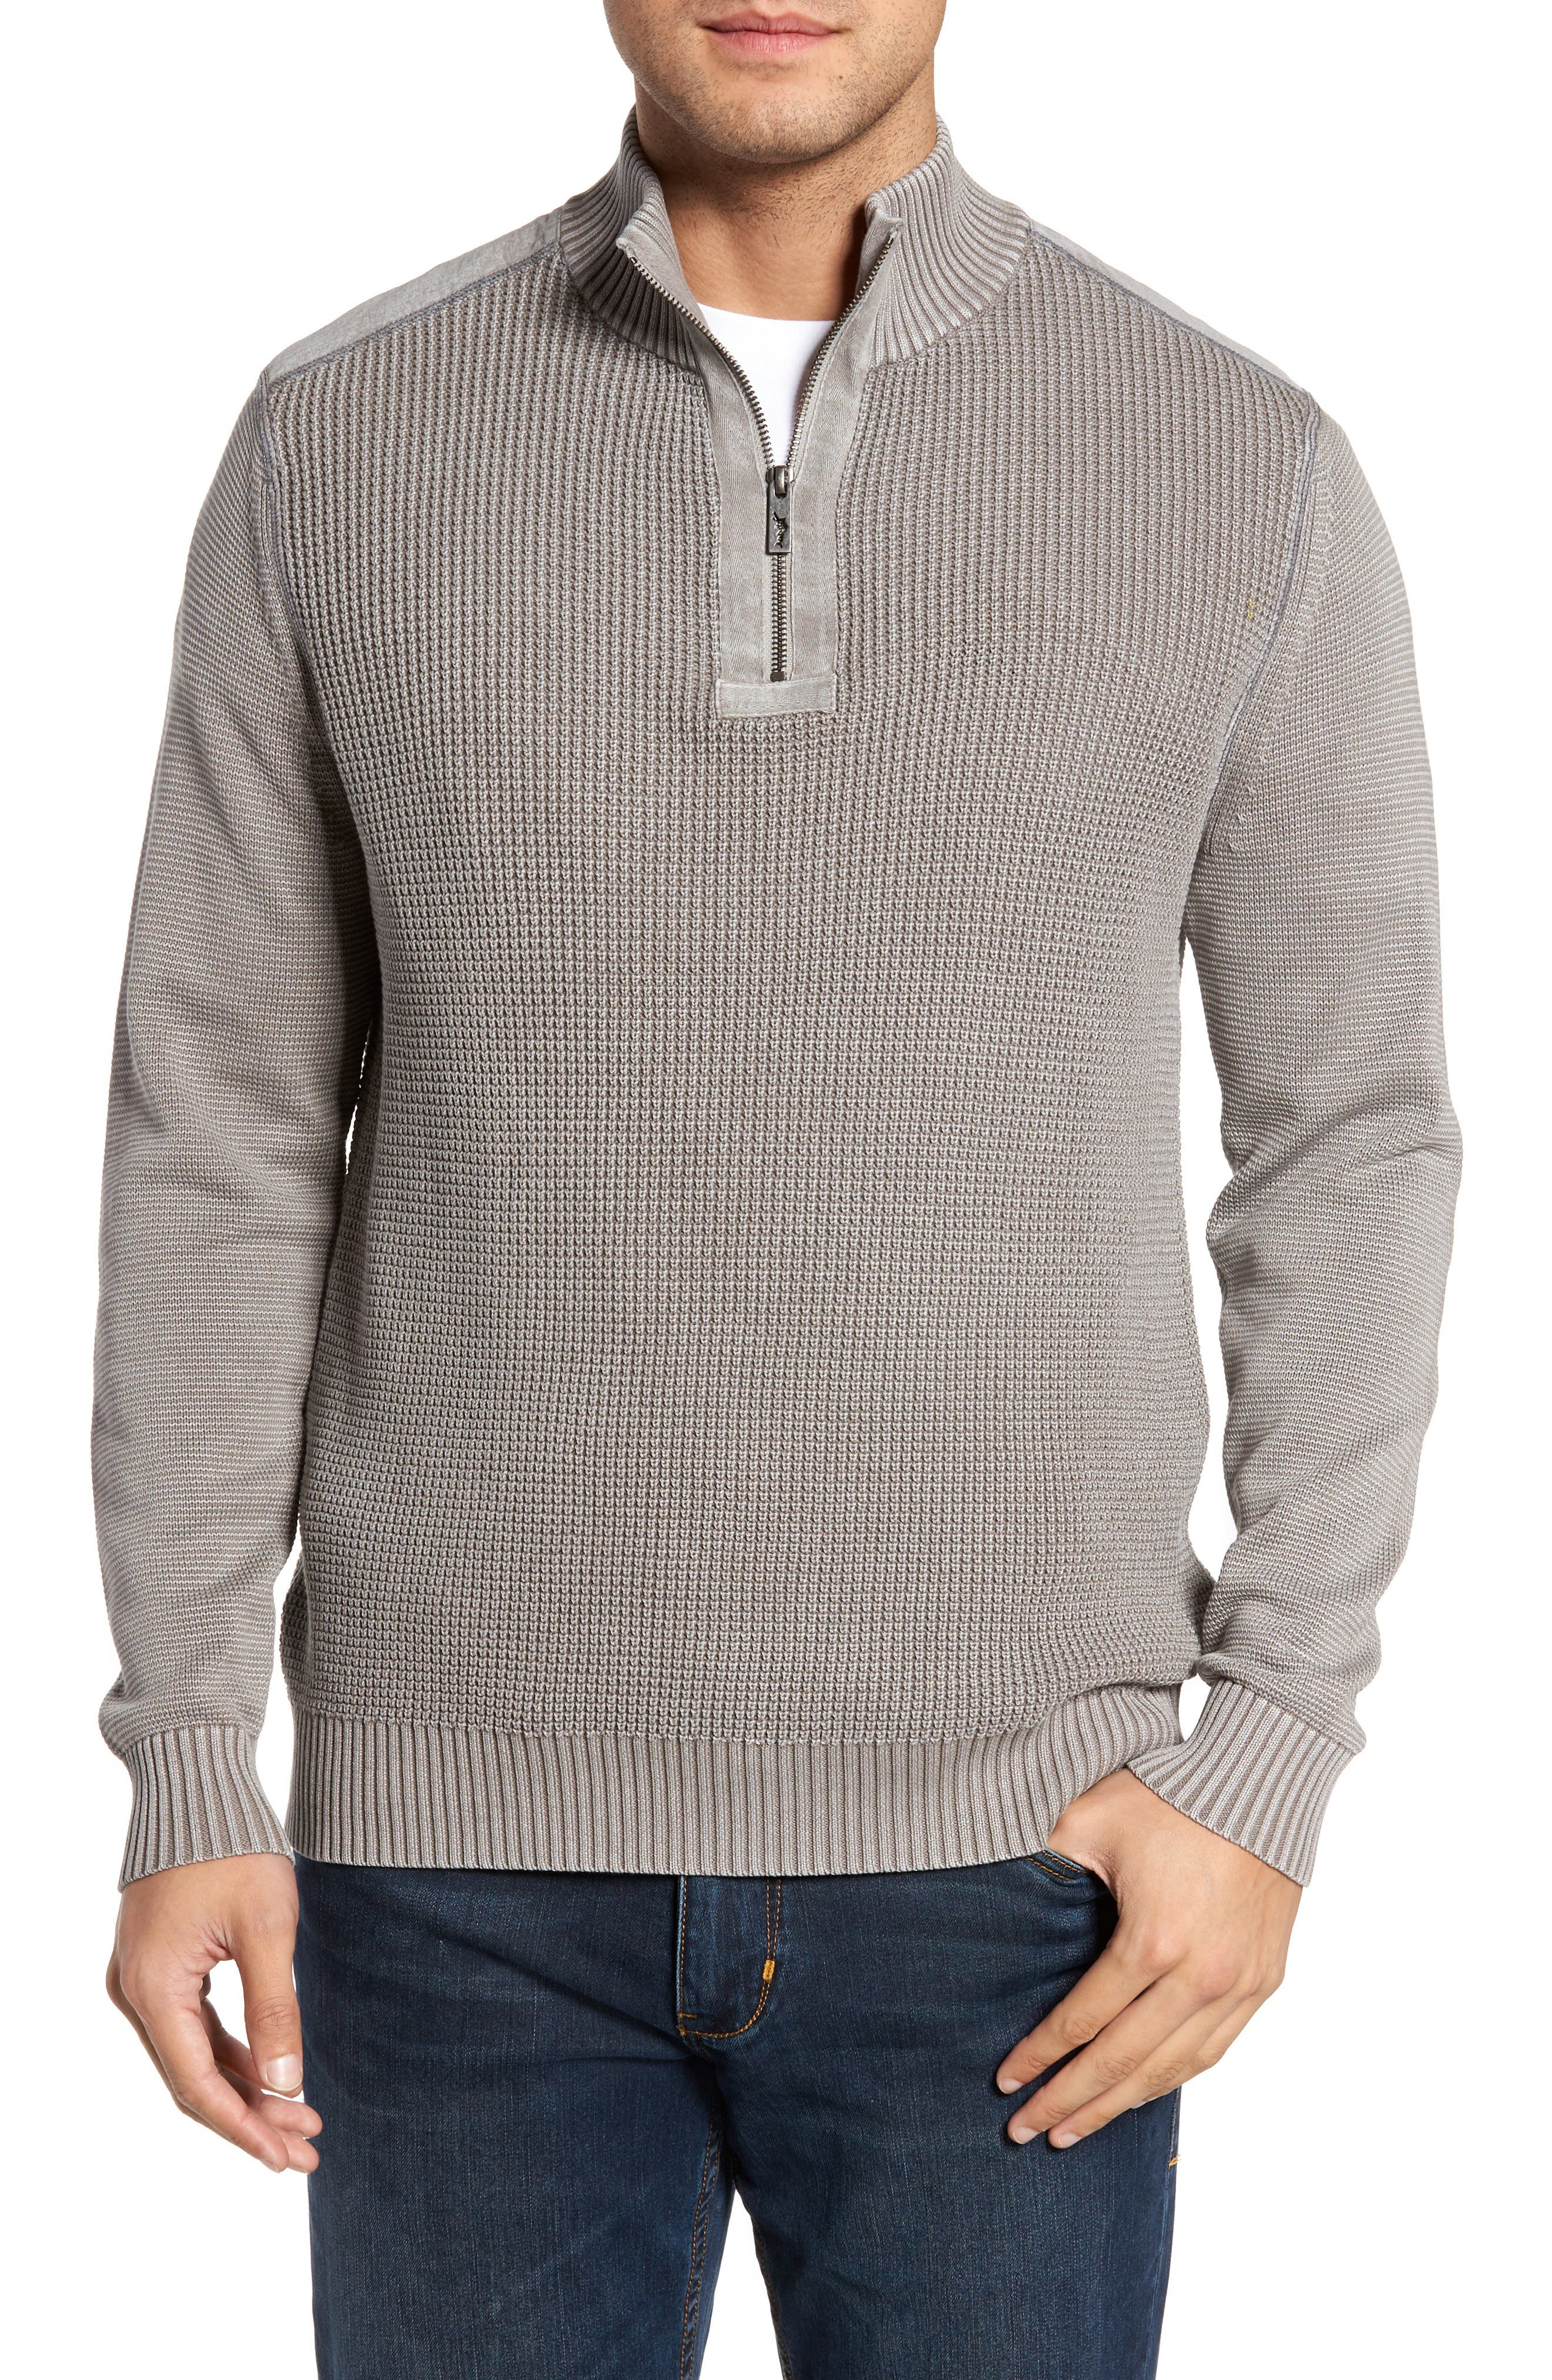 Coastal Shores Quarter Zip Sweater,                             Main thumbnail 2, color,